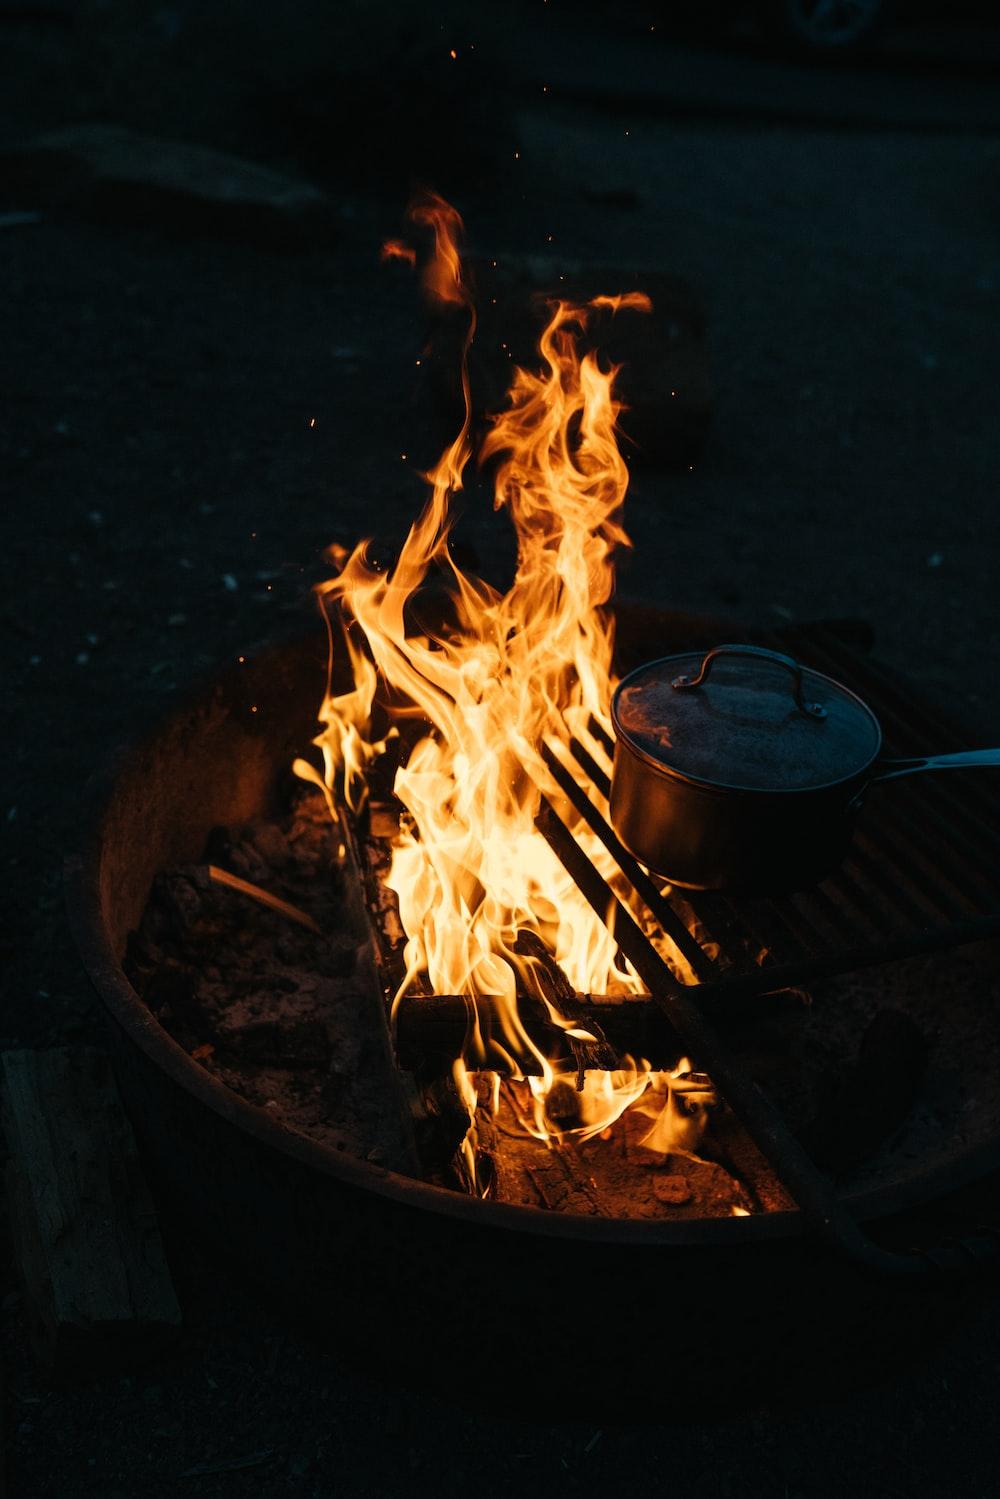 sauce pan on fire